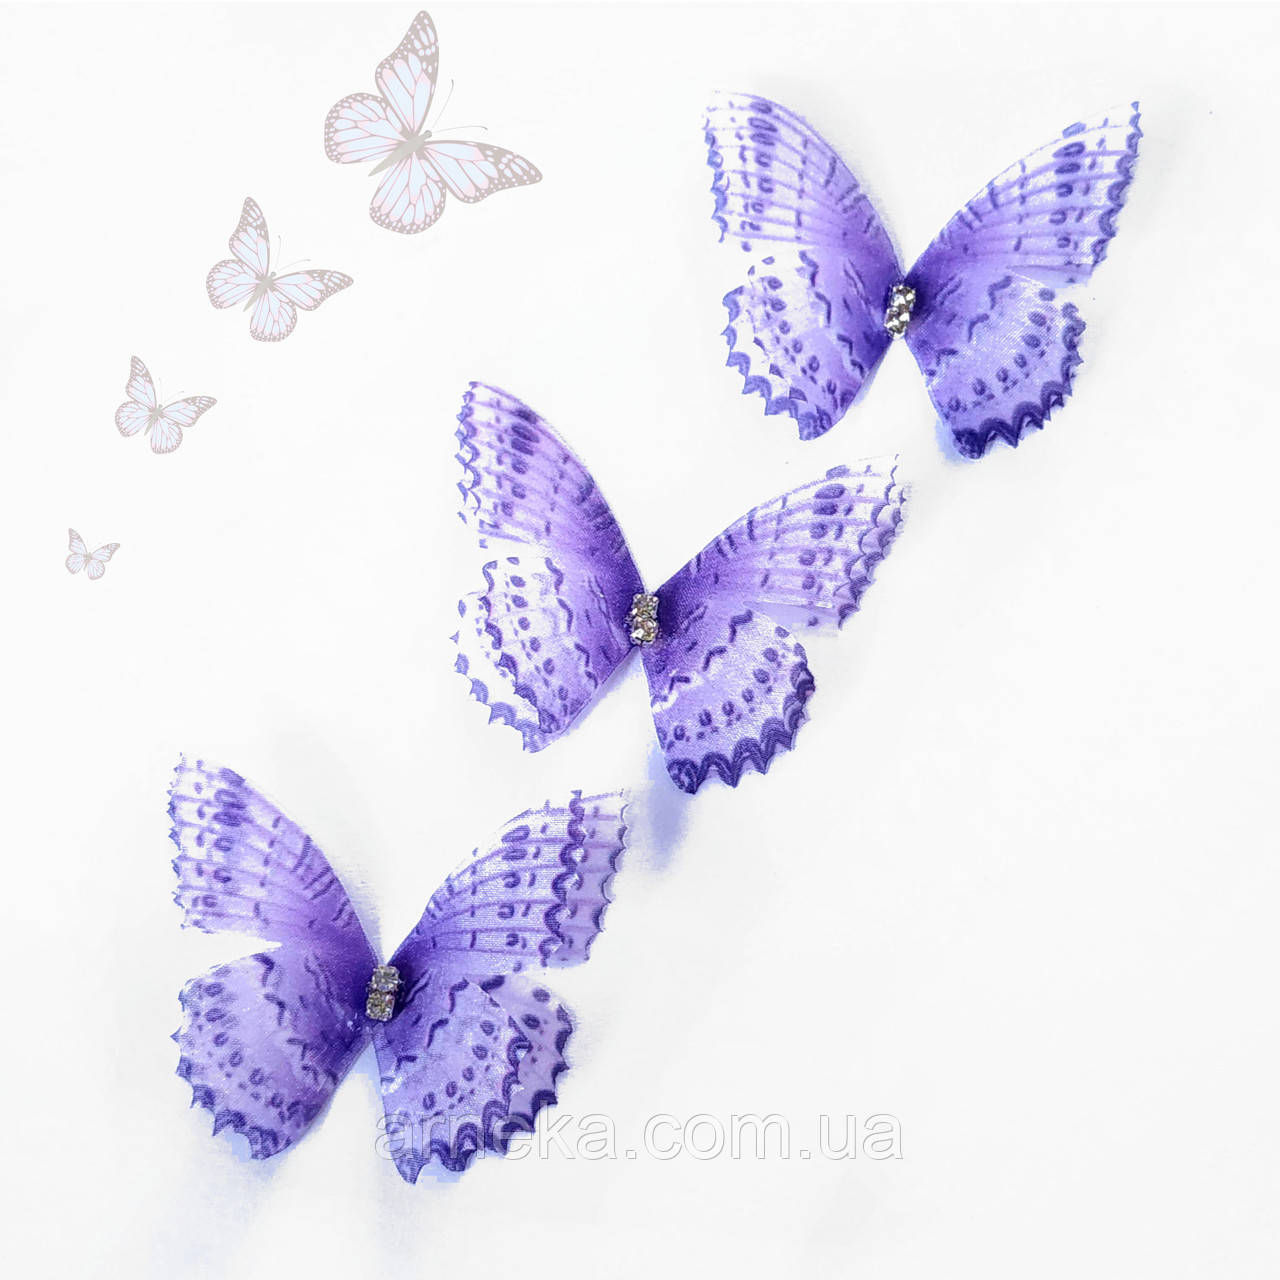 Бабочка шифон, двойные крылья, стразы